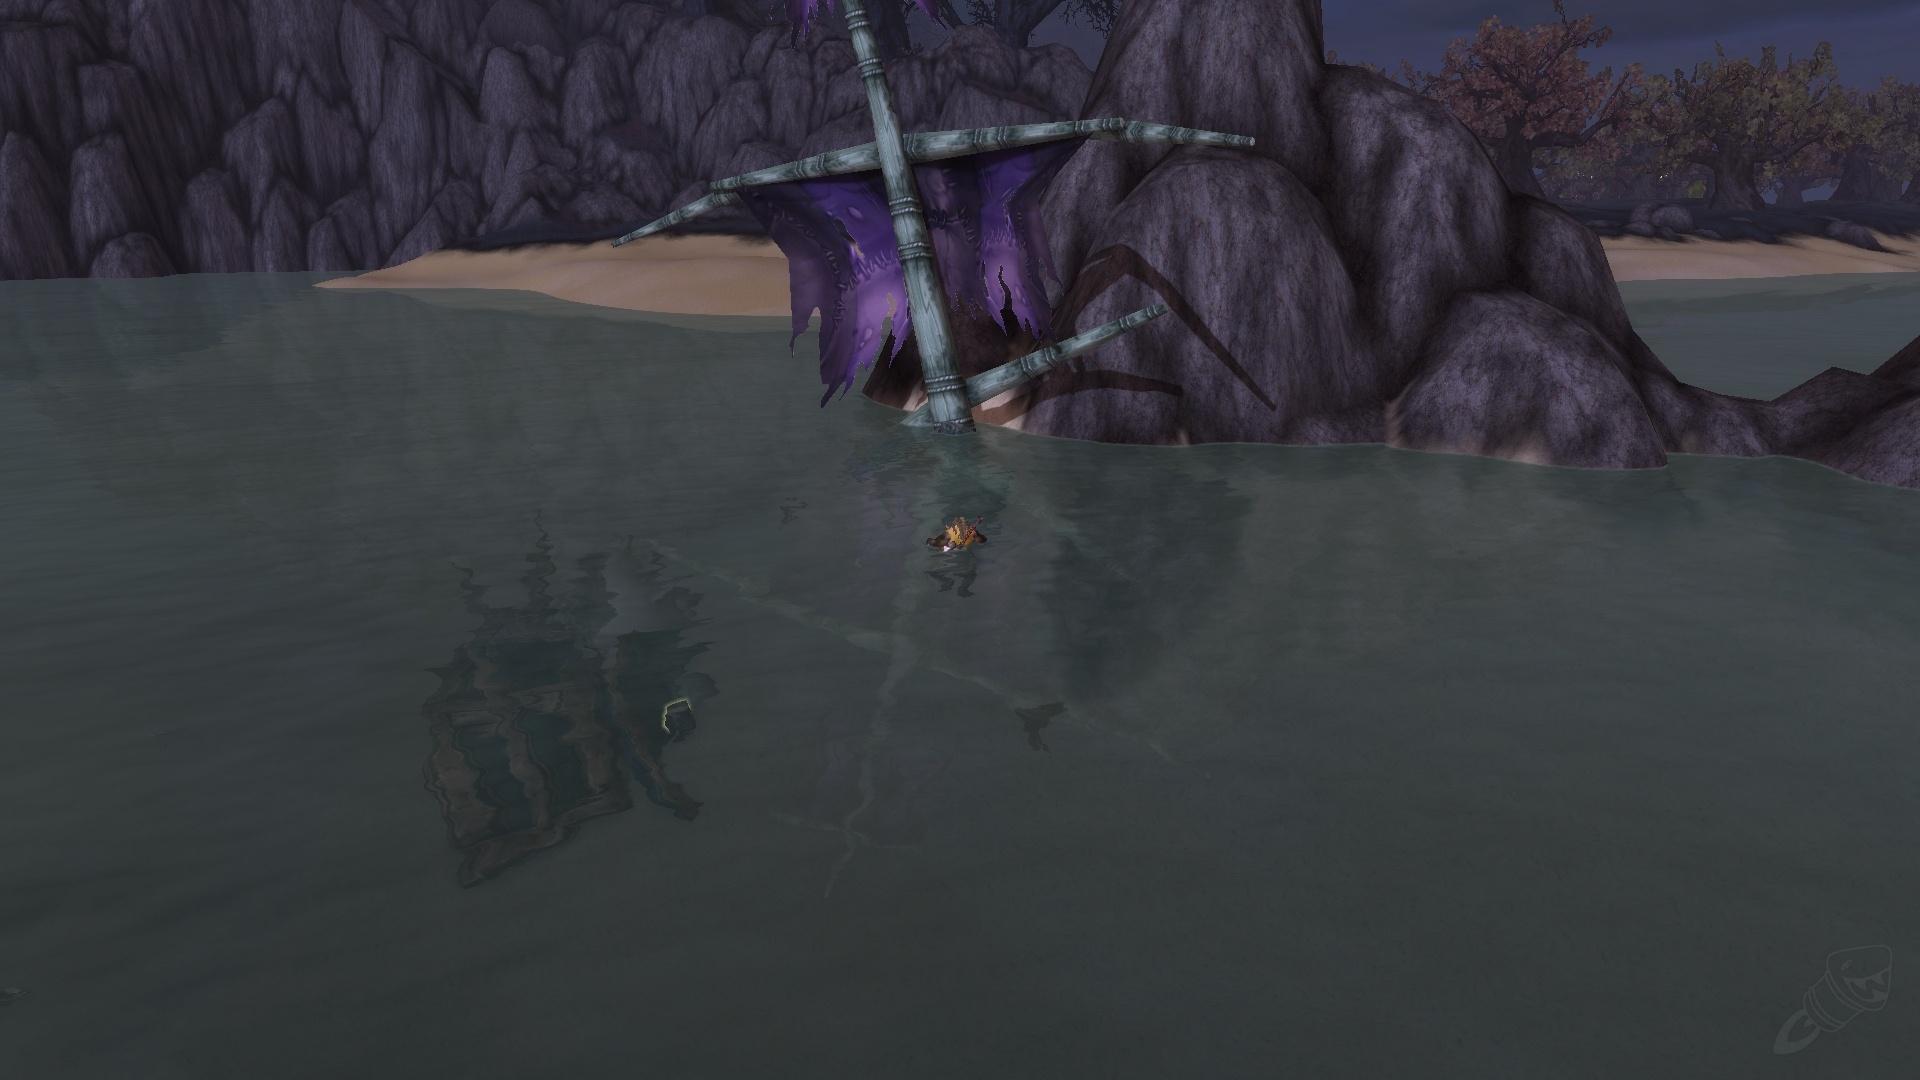 Carte Au Tresor Bfa.Faded Treasure Map Objet World Of Warcraft